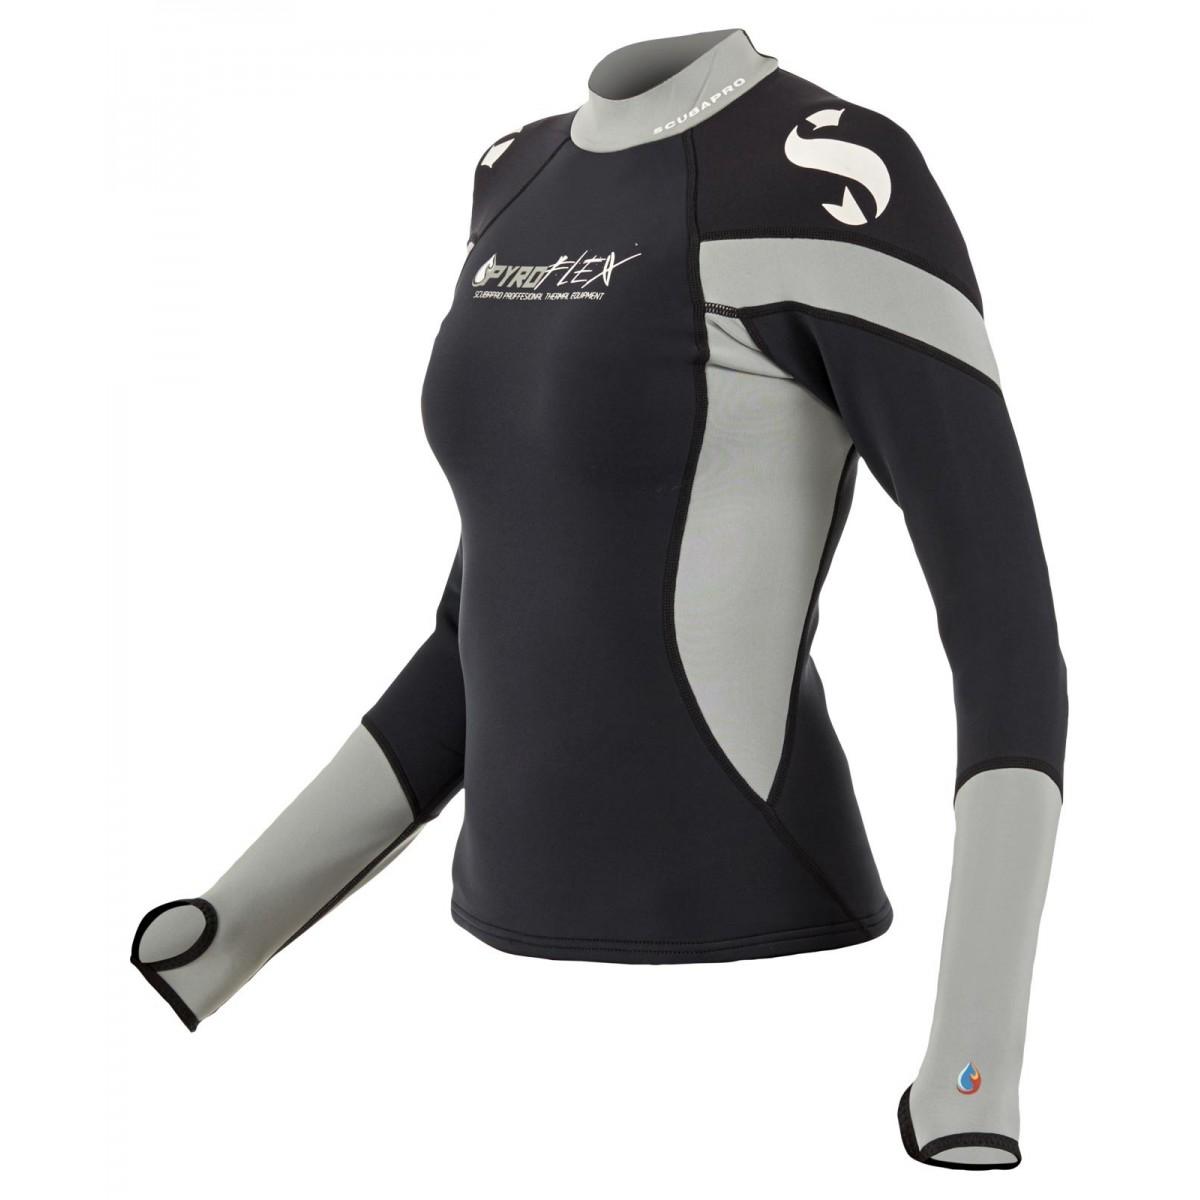 Scubapro Women's Pyroflex Long Sleeve Rash Guard